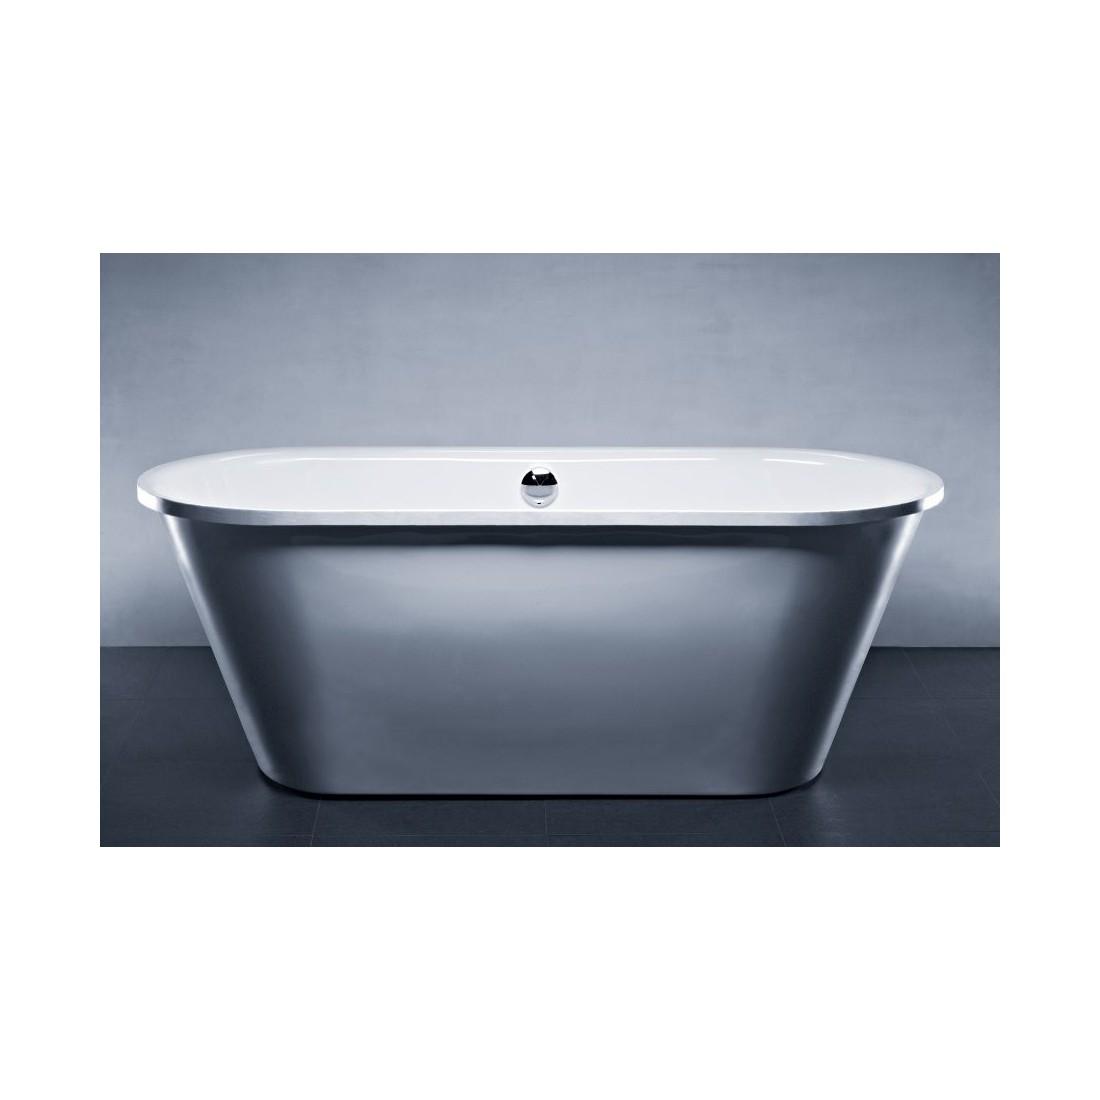 Akmens masės vonia Vispool Accent 167x71